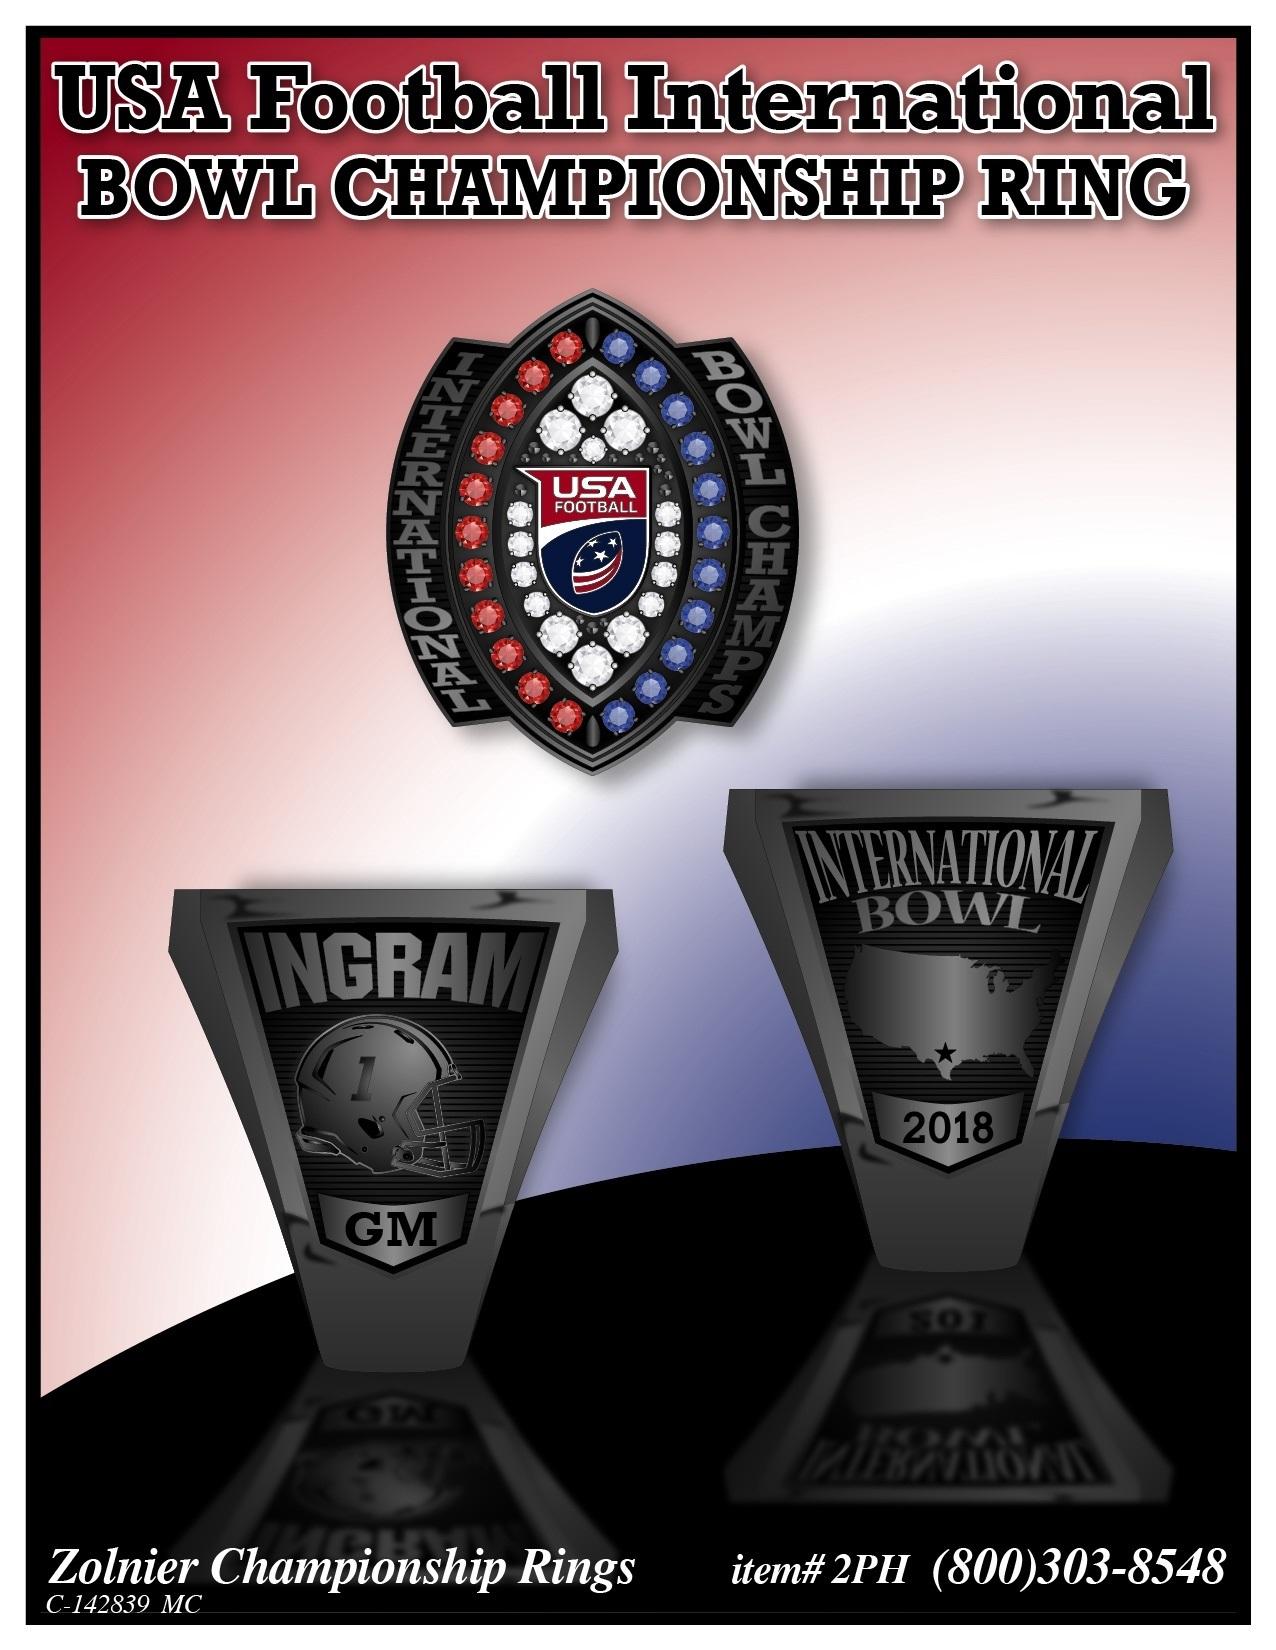 C-142839 USA Football Champ Ring